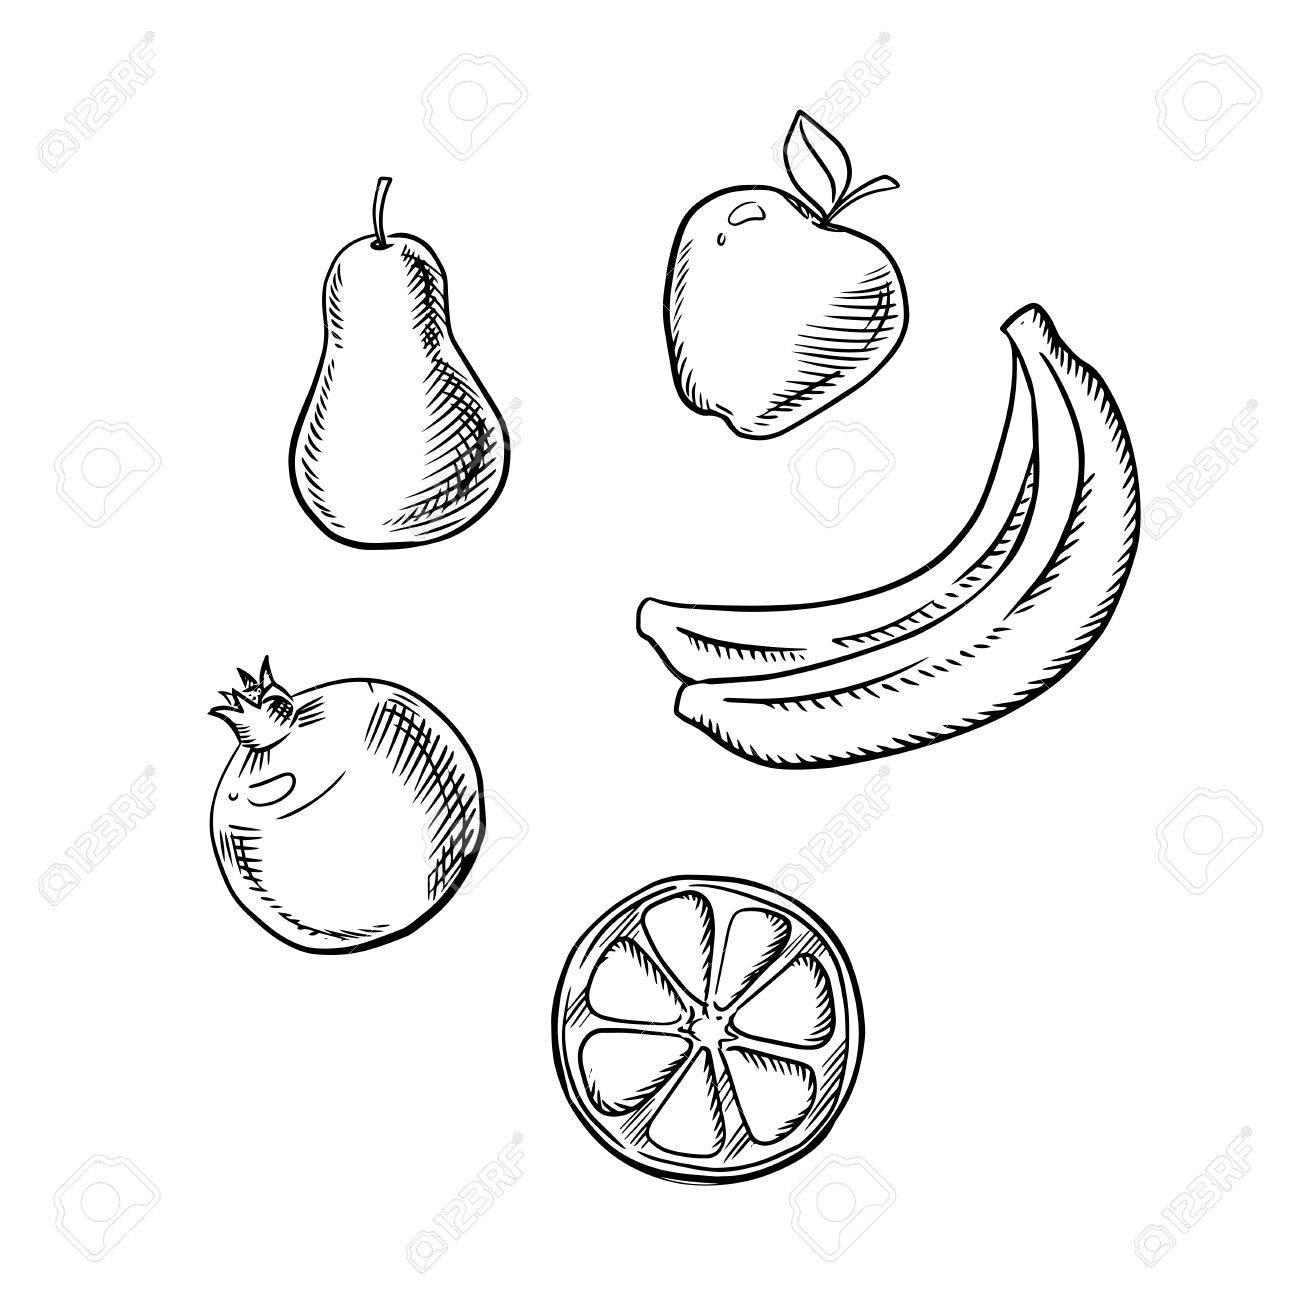 1300x1300 Fresh And Juicy Apple, Pear, Slice Of Lemon, Bunch Of Banana